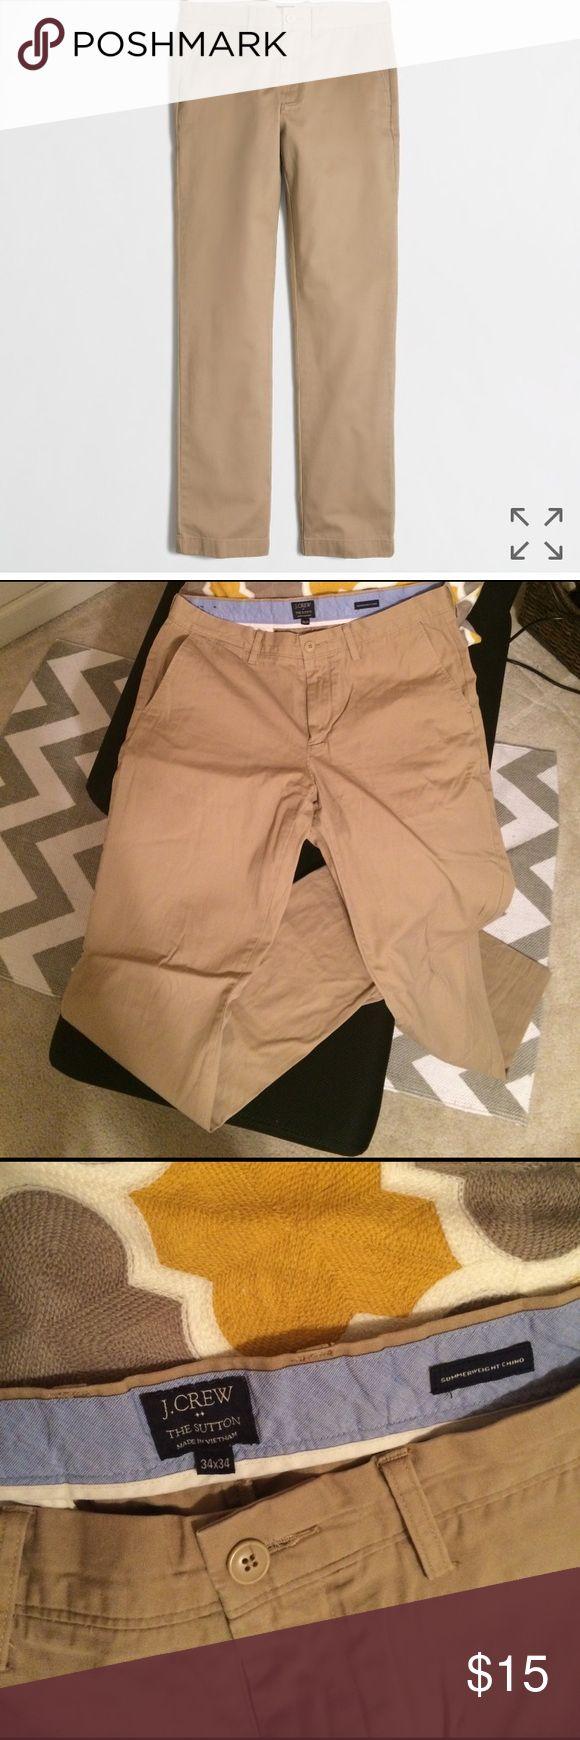 🌟flash sale!🌟JCrew The Sutton trouser British khaki beige pants. Slim fit. Zip fly. Barely worn. J. Crew Pants Chinos & Khakis